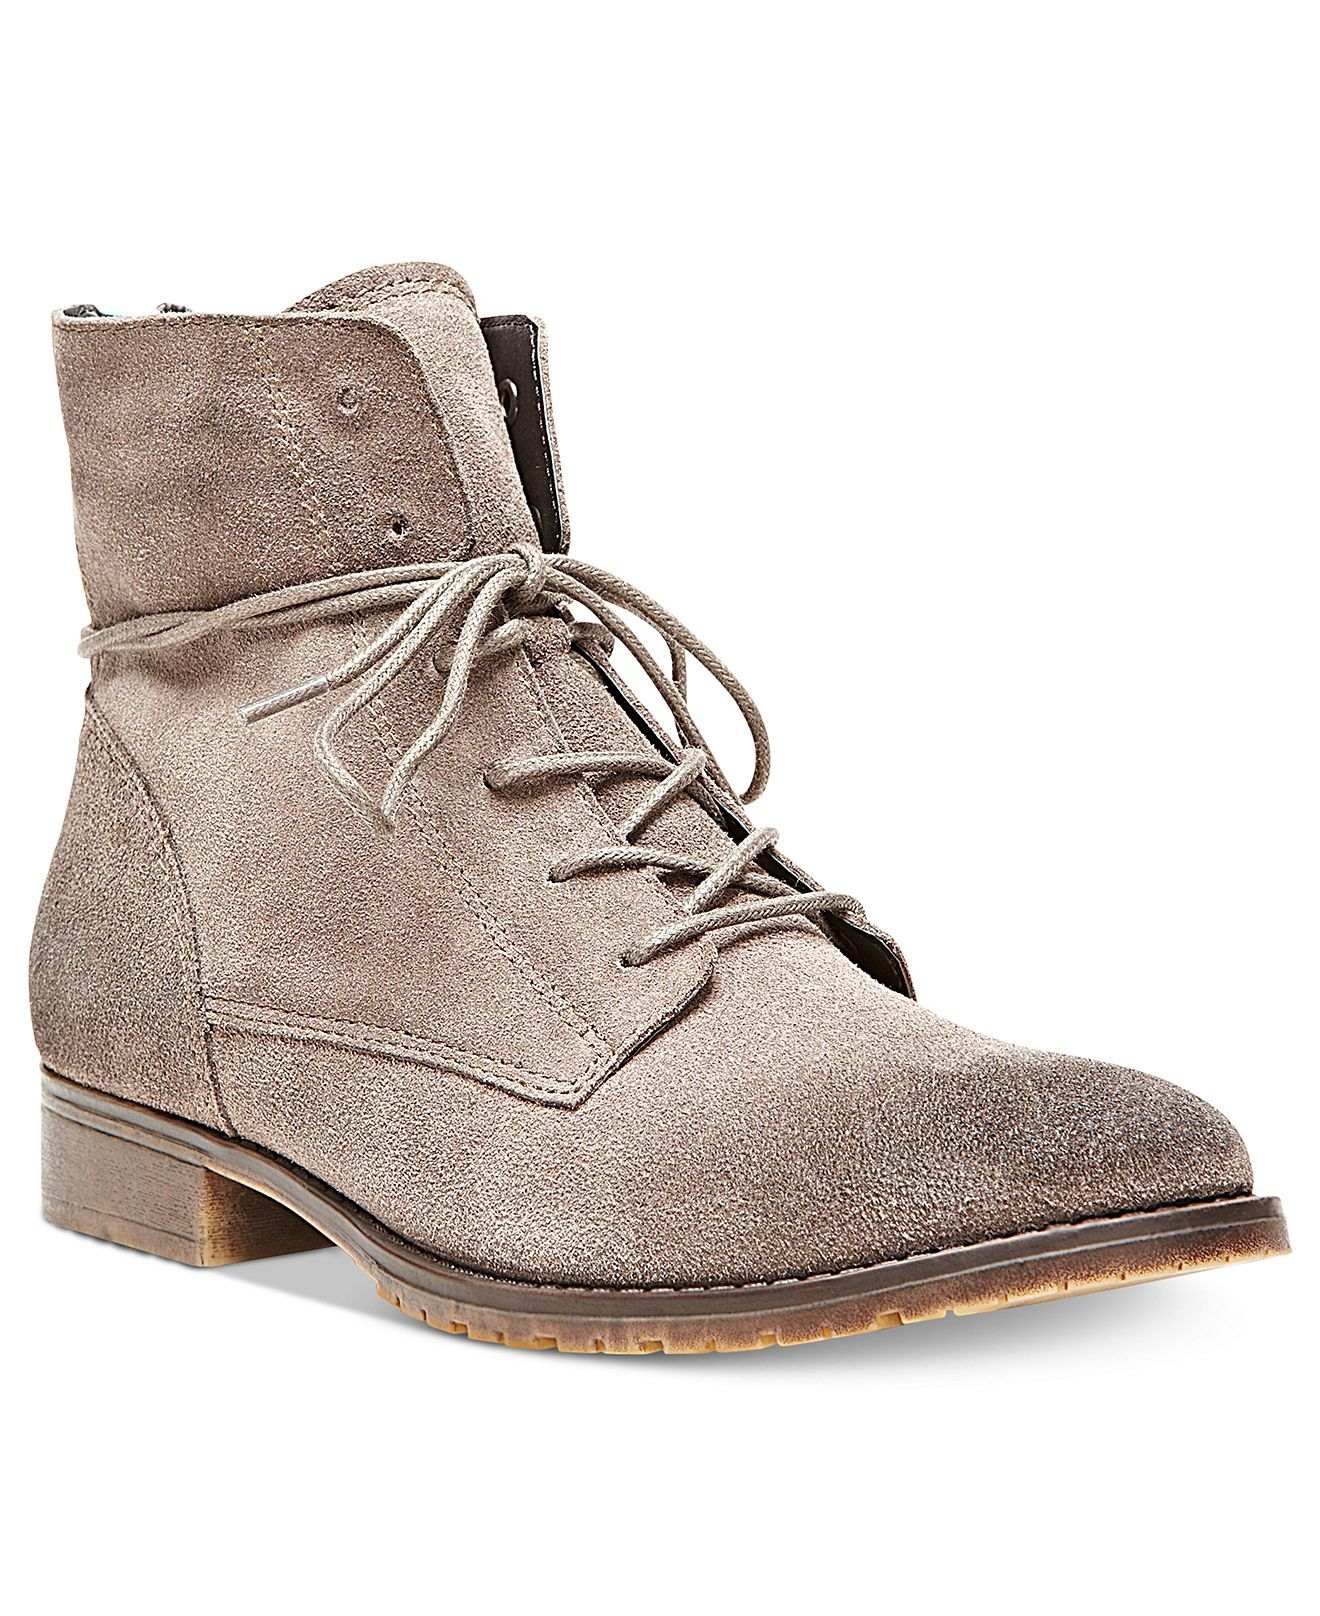 375199930f4 Steve Madden Women's Rawling Booties - Shoes - Macy's -- NEEEEEED ...